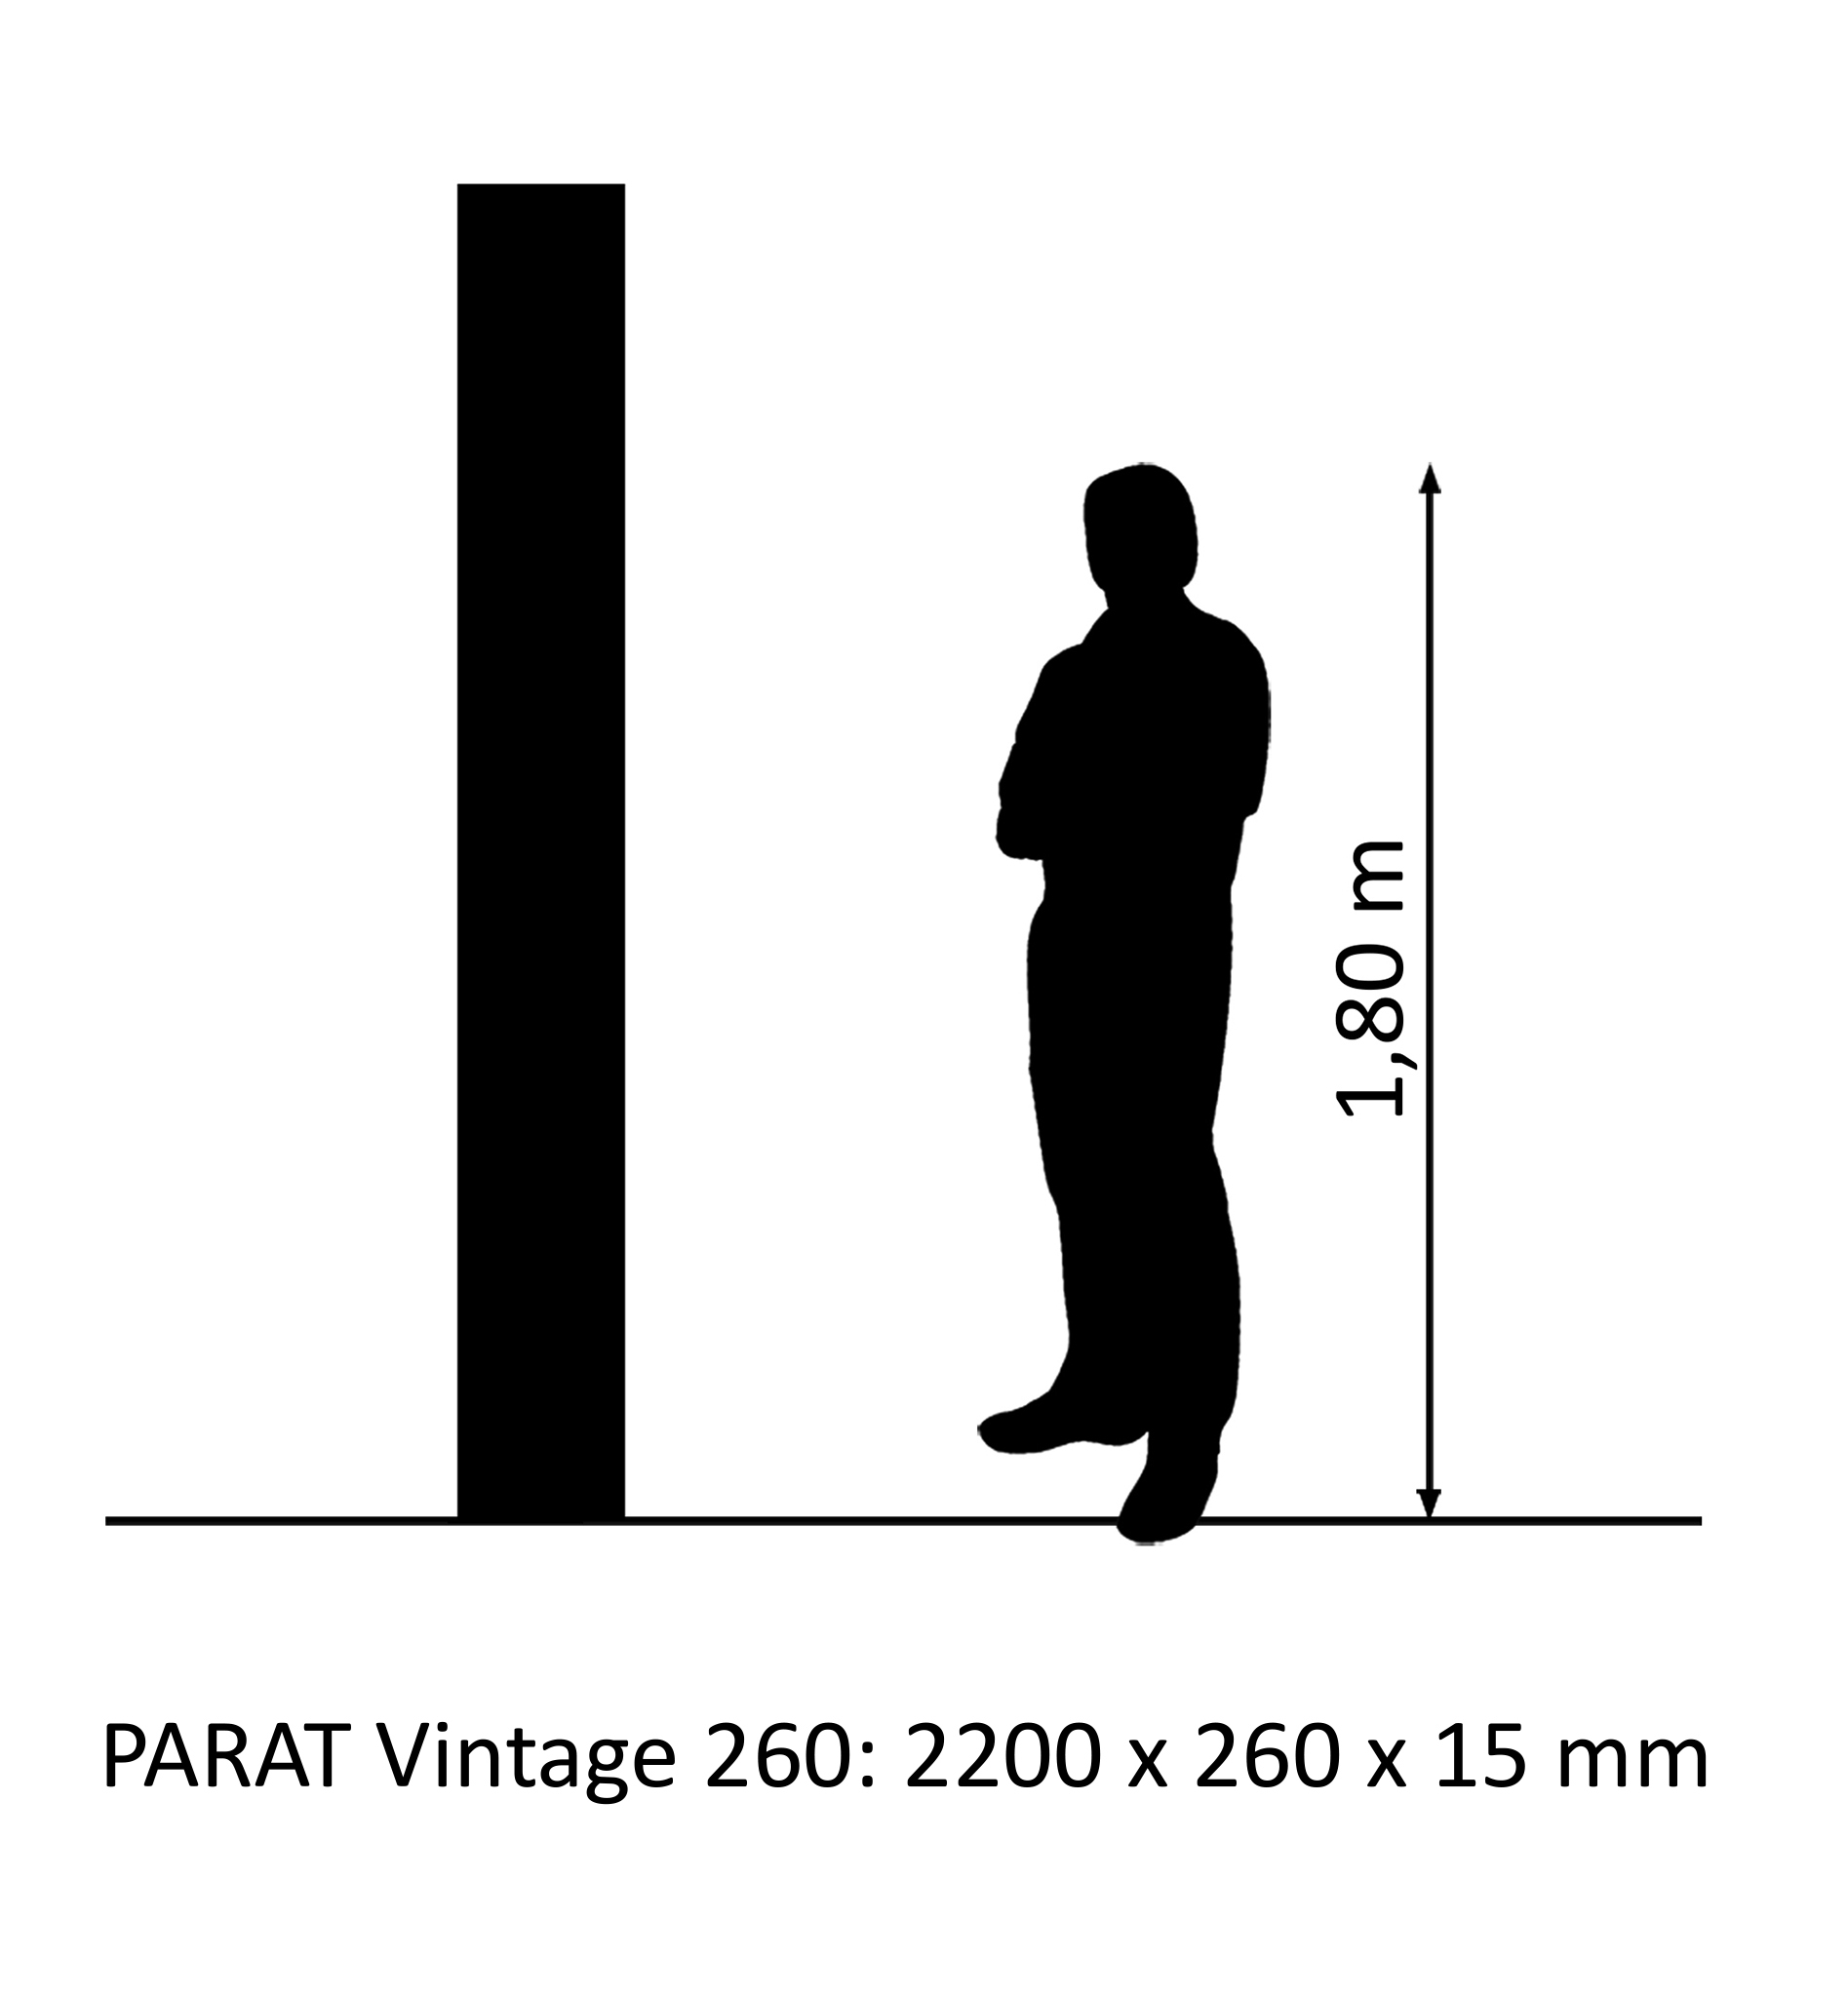 PARAT Vintage 260 oak XL wideplank